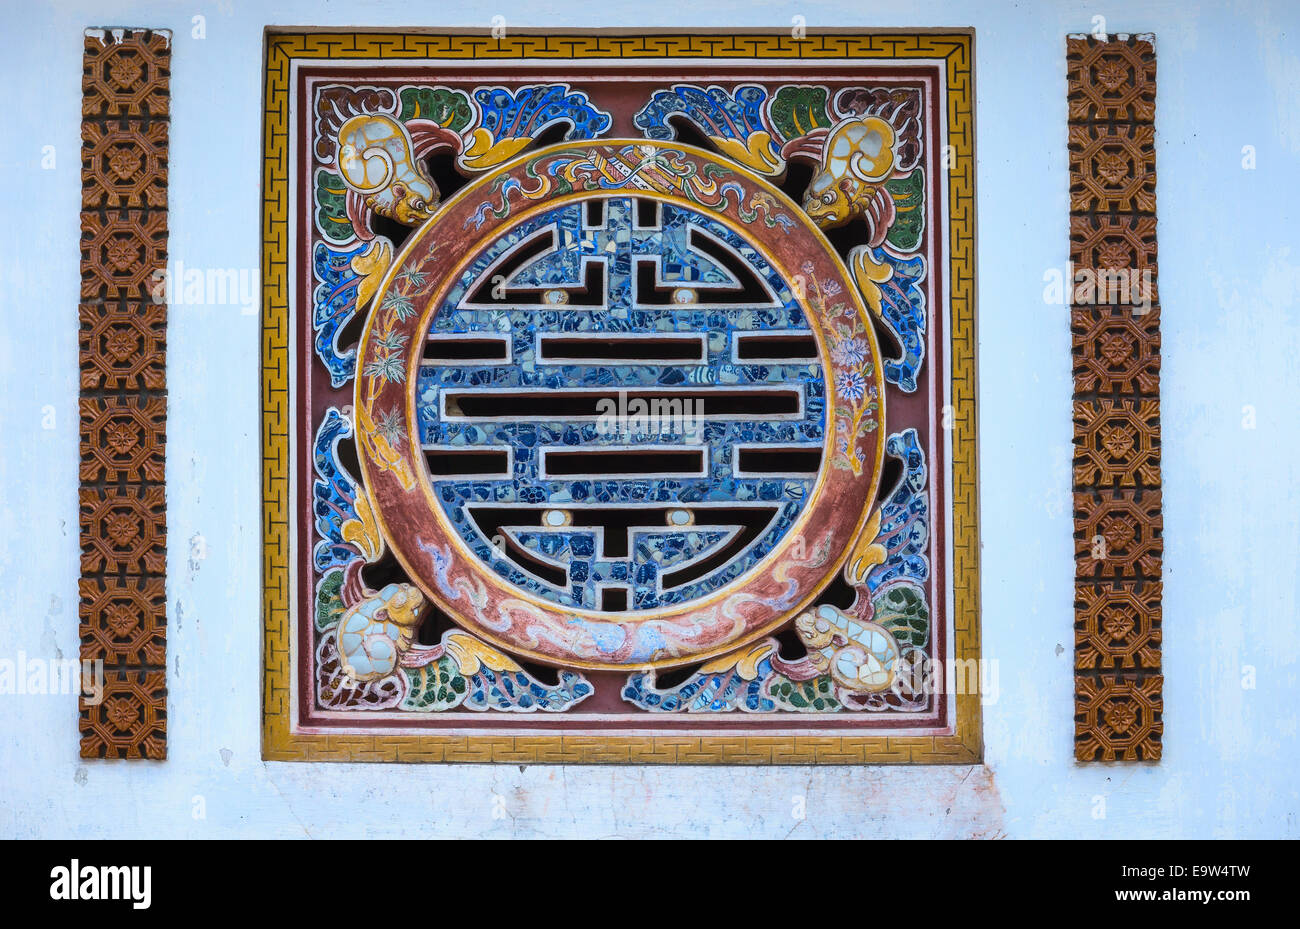 Vietnam Hué Citadel: Longevity symbol as window in wall of palace. - Stock Image